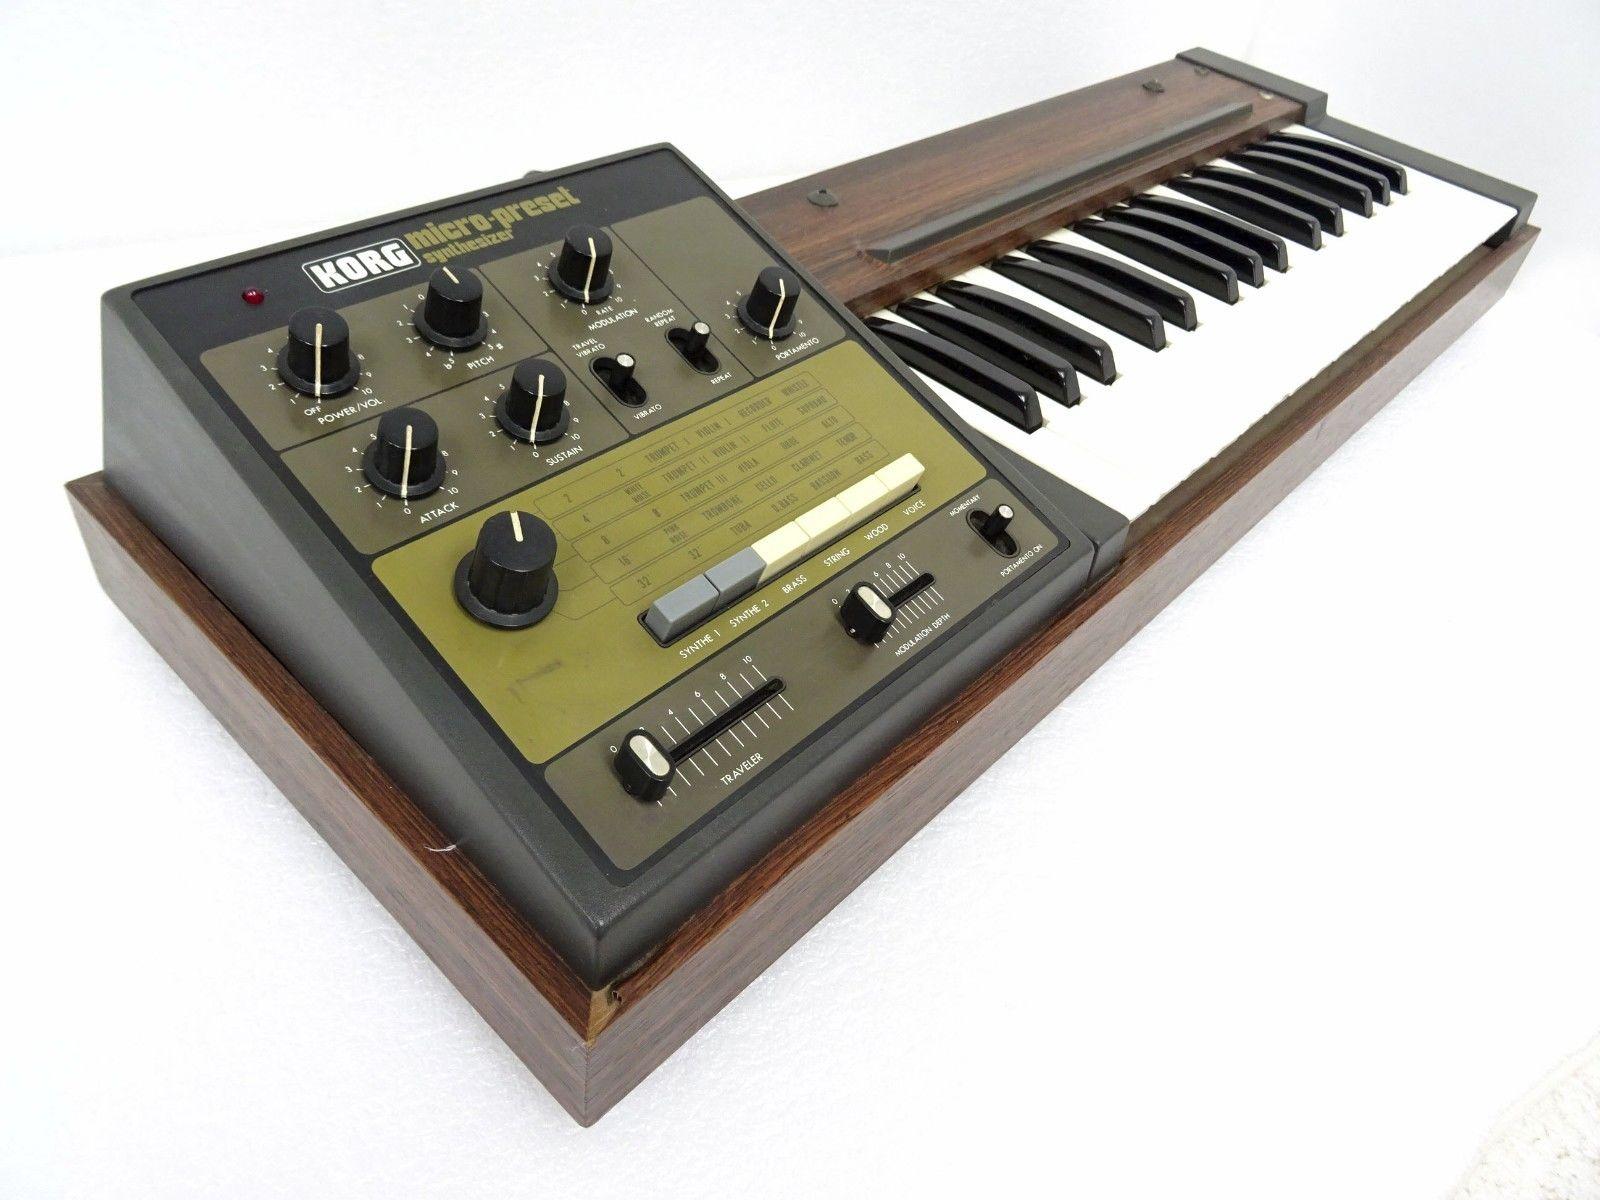 matrixsynth korg m 500sp micro preset vintage analog synth m500 with speaker sn 781345. Black Bedroom Furniture Sets. Home Design Ideas